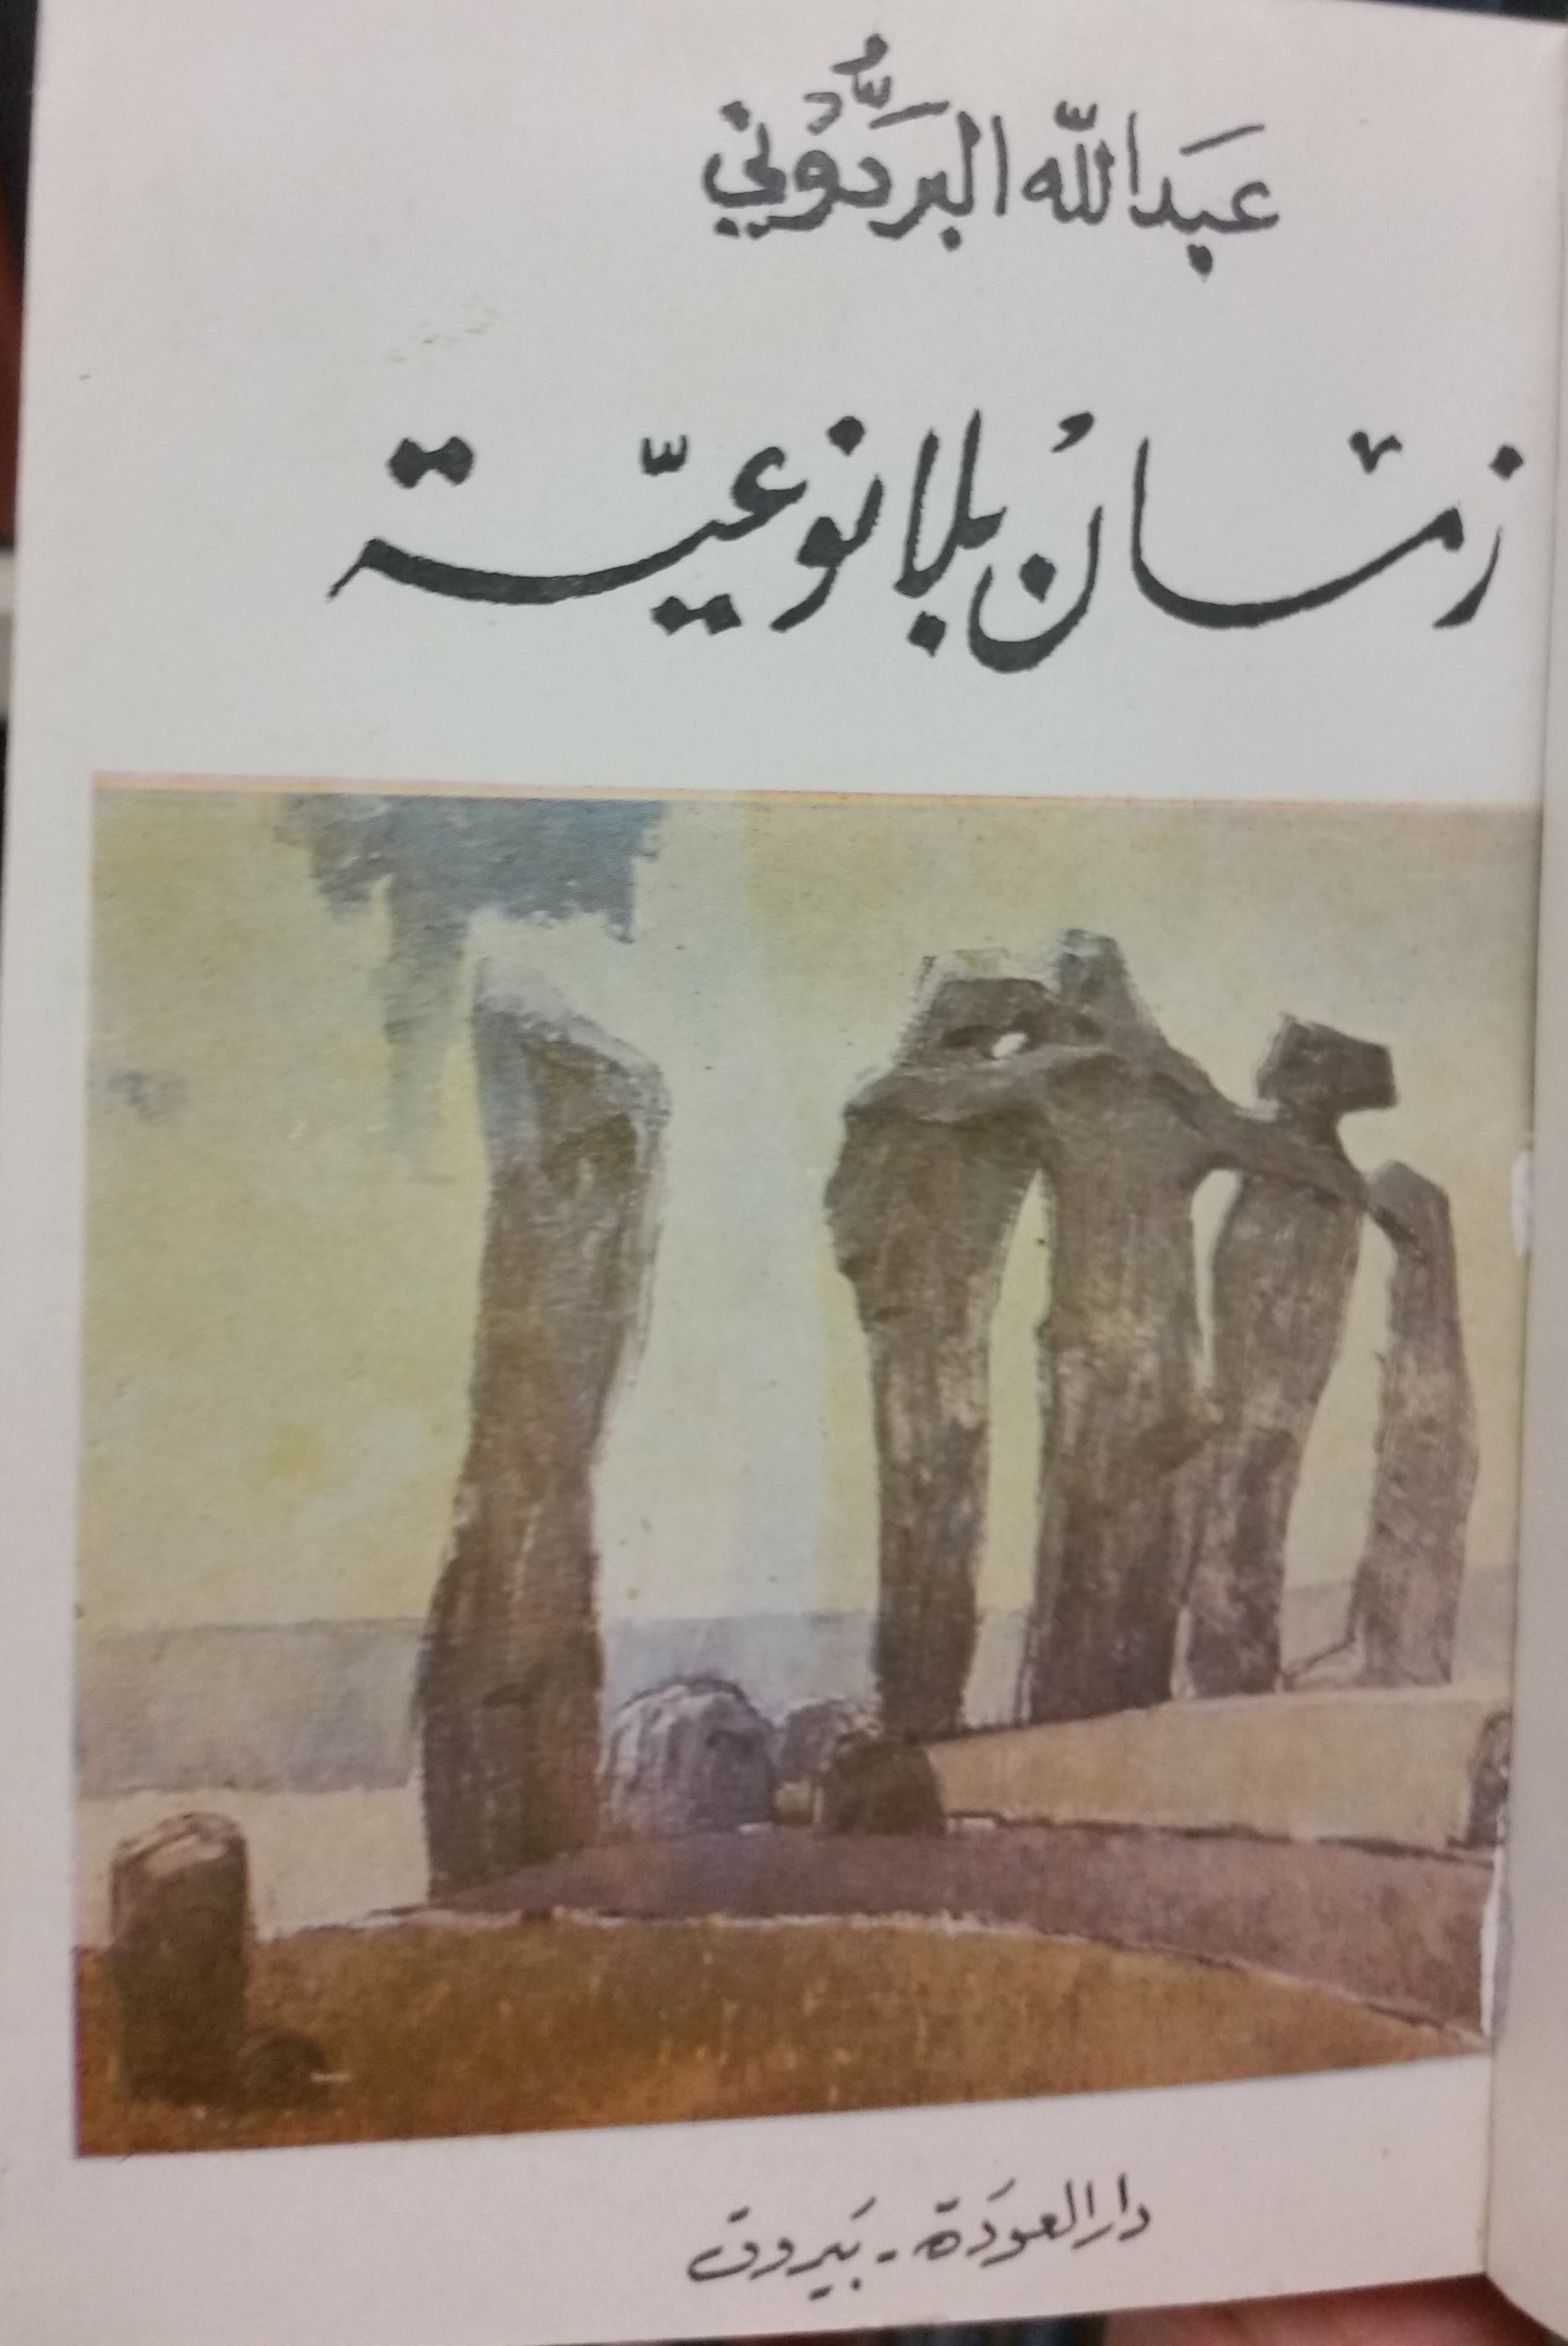 ʻAbd Allāh al-Bardūnī, Zamān bi-lā nawʻ̄ıyah: shiʻr (Bayrūt : Dār al-ʻAwdah, 1980)